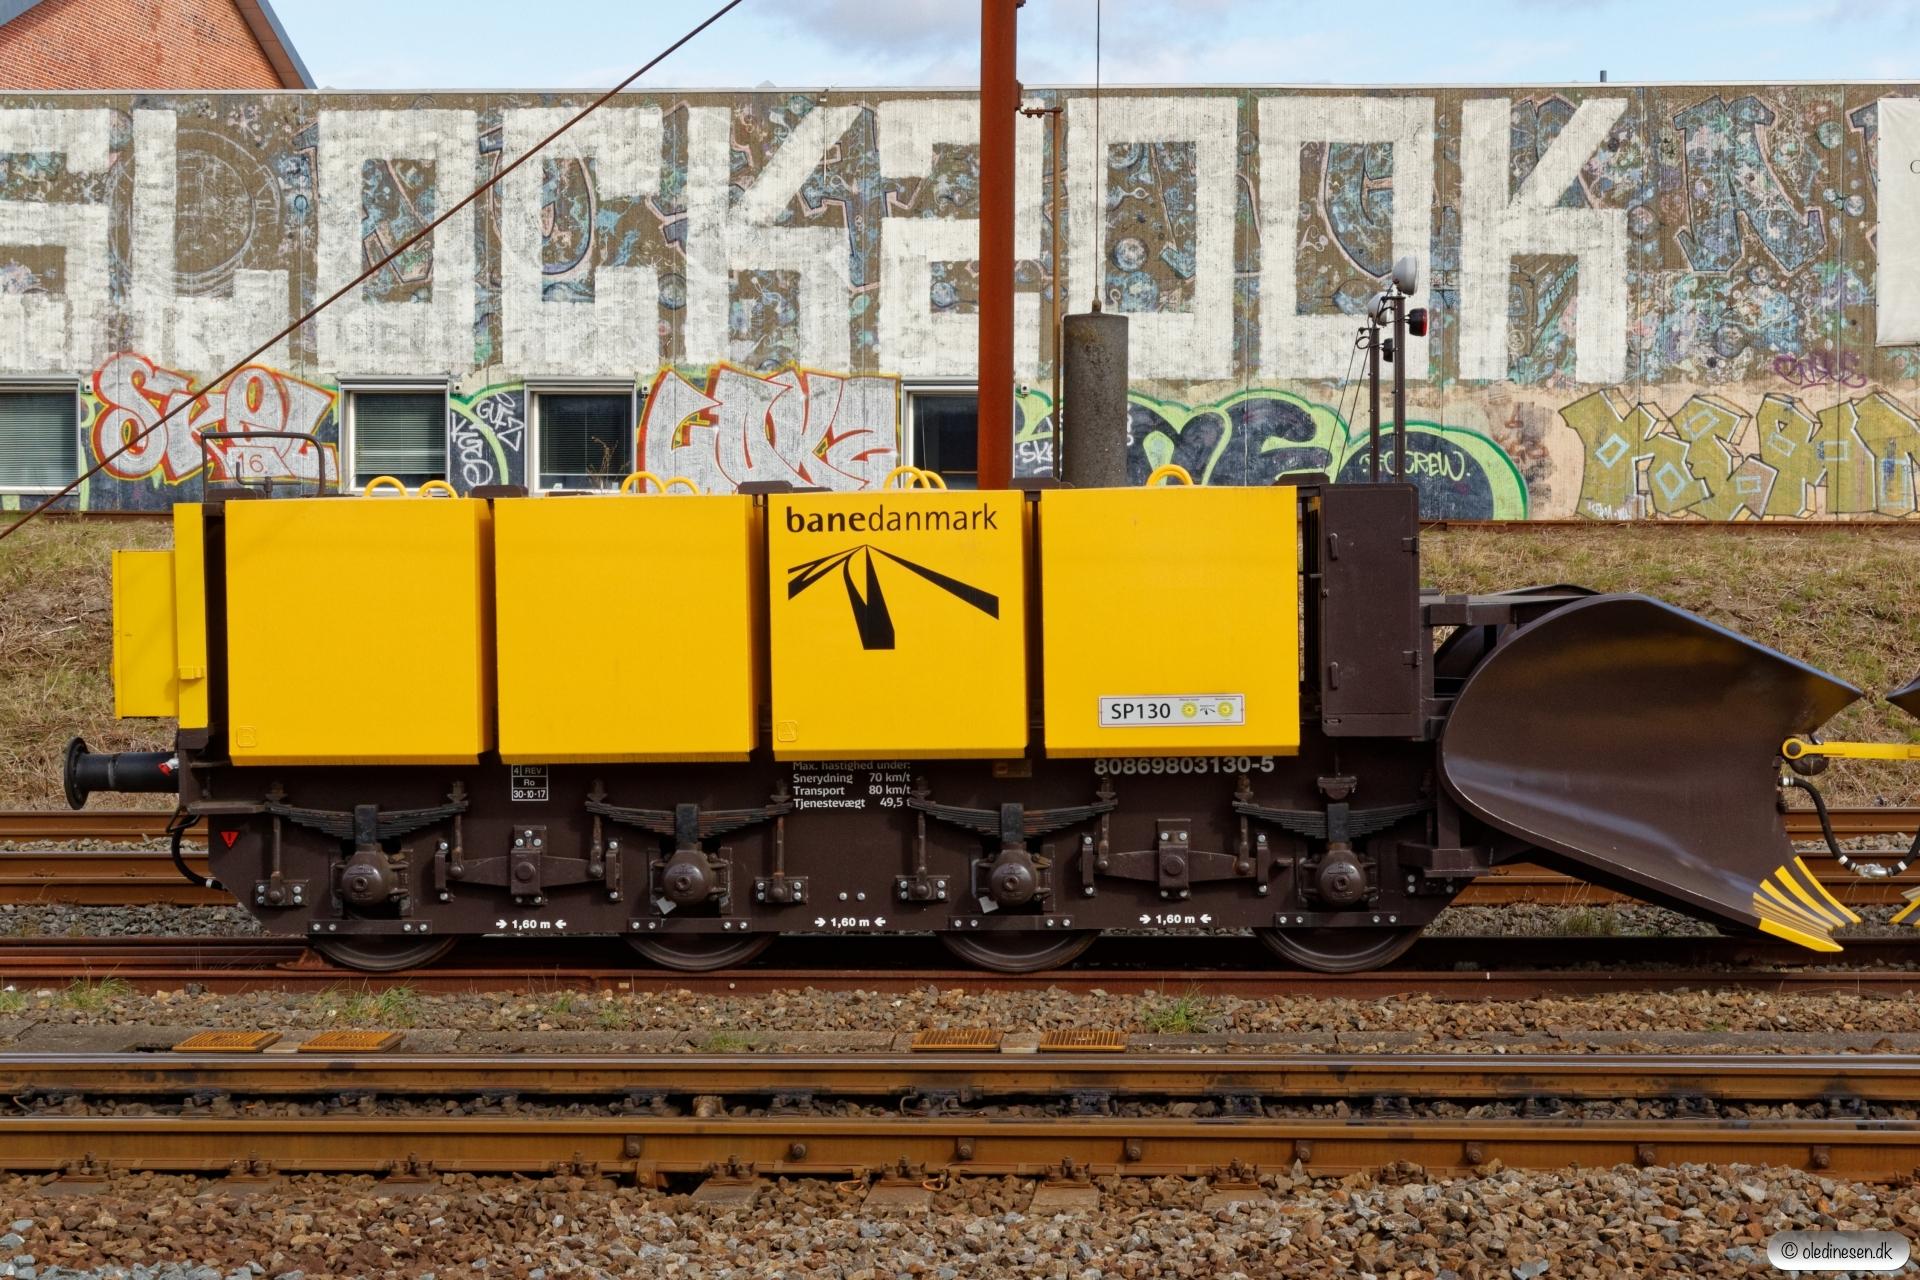 ENT 80 86 980 3 130-5. Odense 04.04.2020.